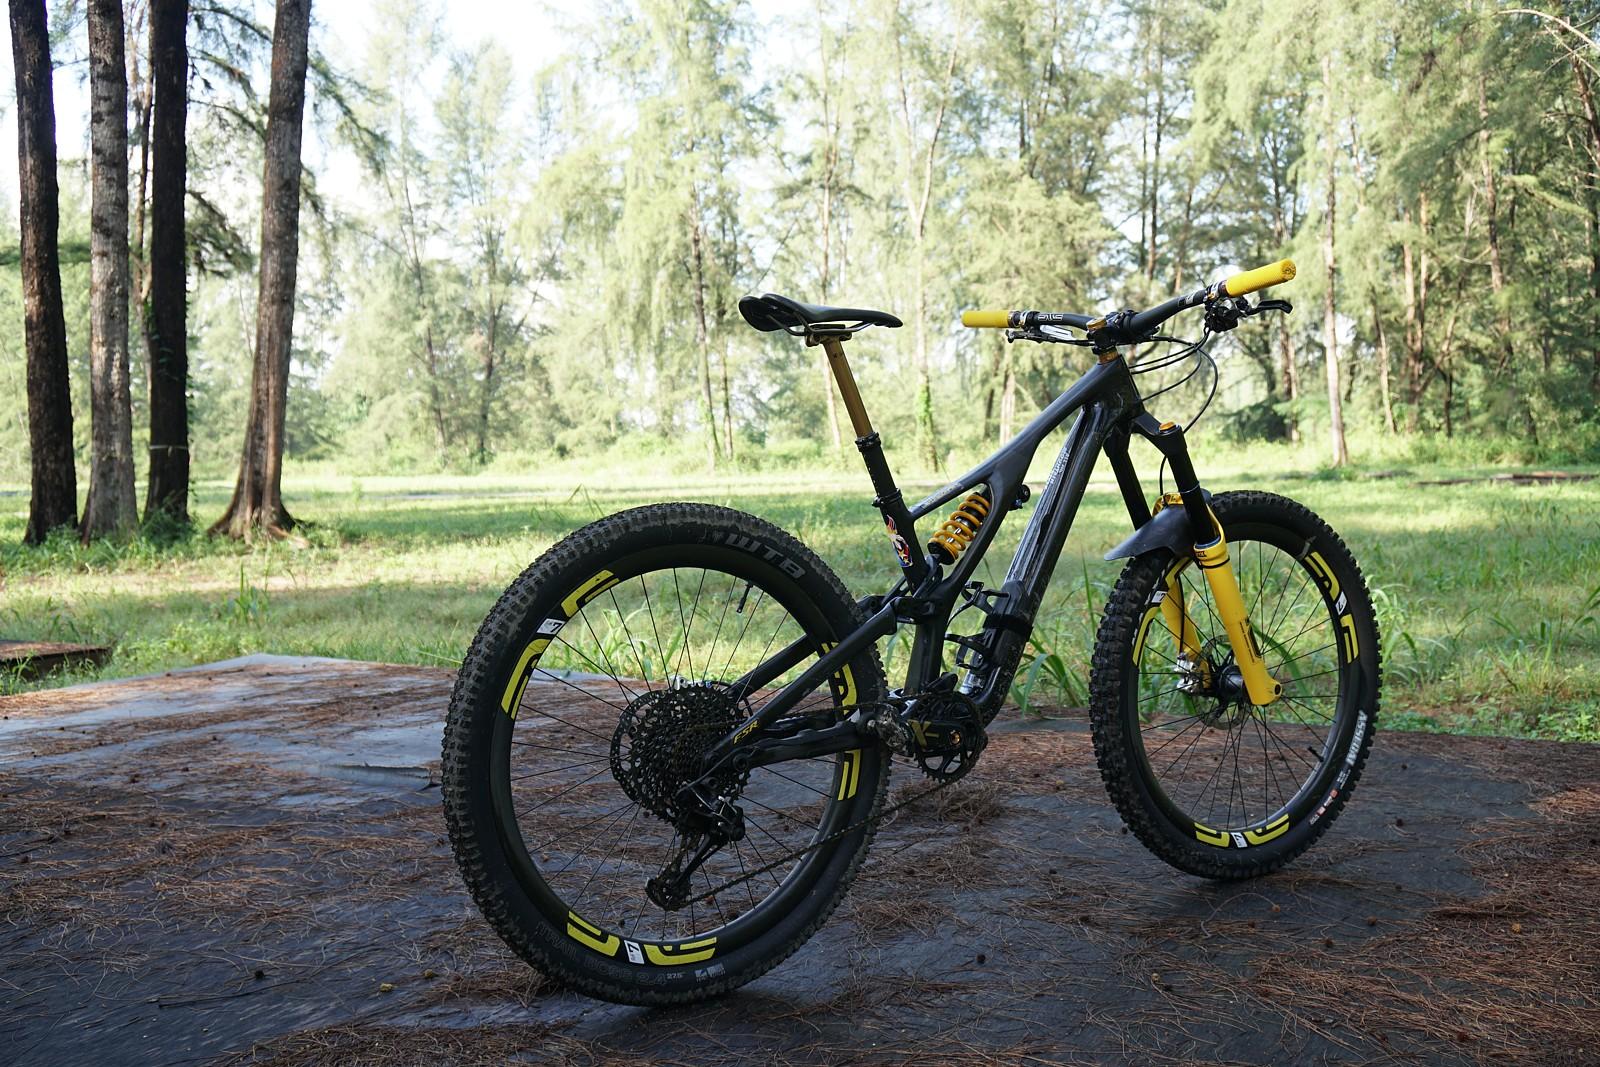 DSC07963 - lesterjade240 - Mountain Biking Pictures - Vital MTB